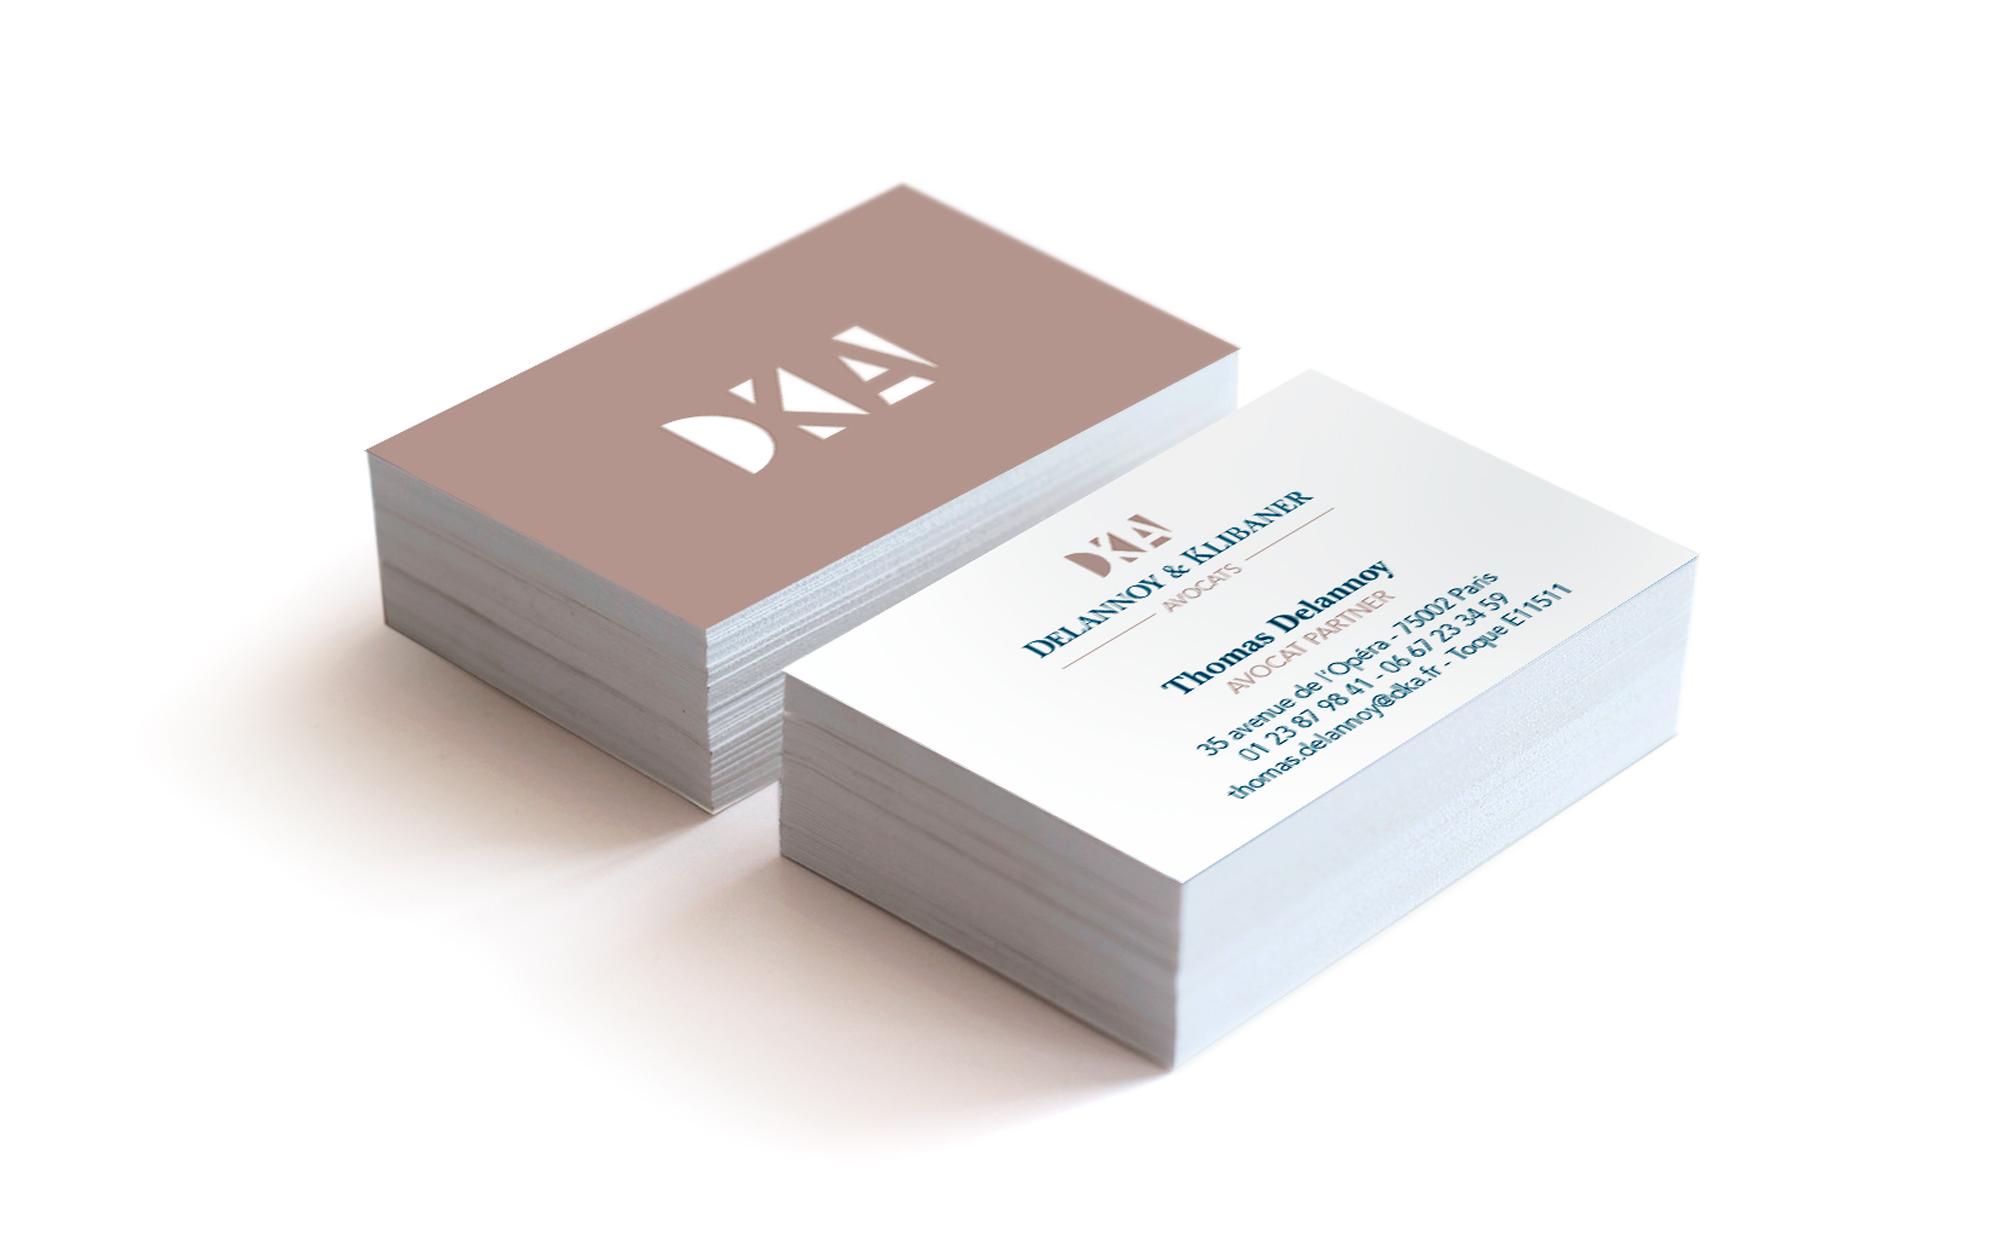 Cartes de visite imprimées Delannoy & Klibaner Avocats